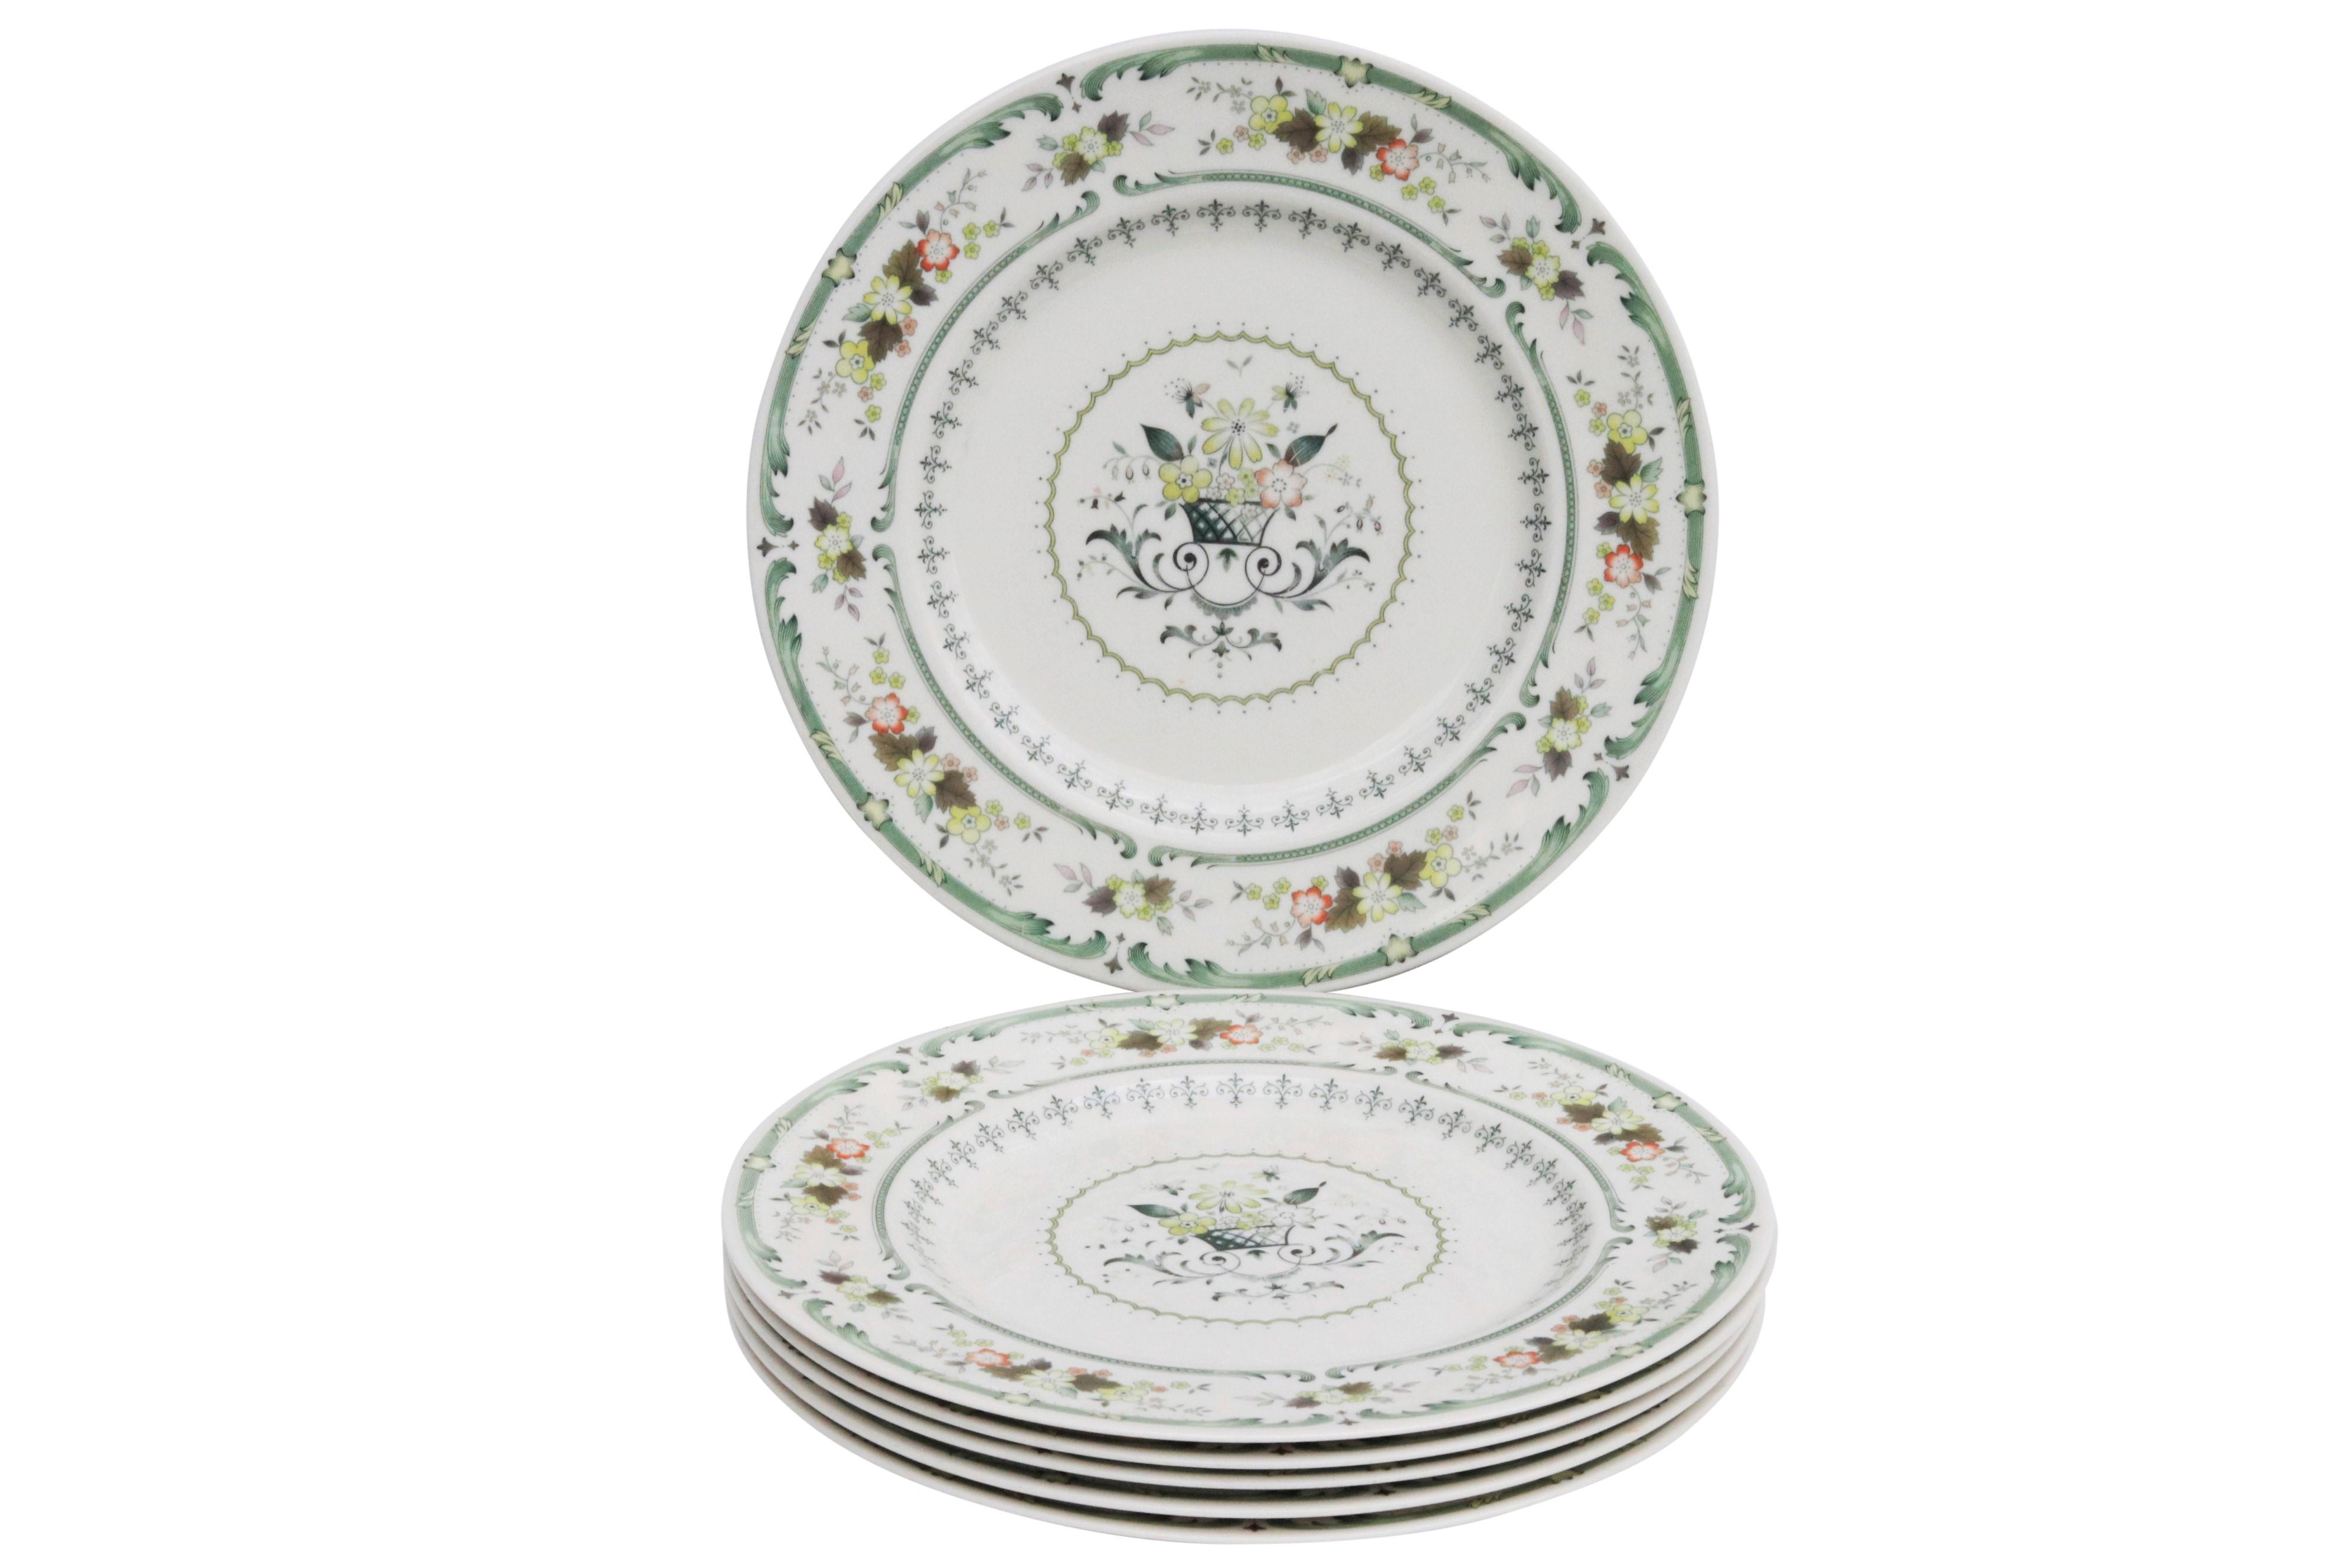 English Fine China Plates by Royal Doulton - Set of 6 - Image 7 of 7  sc 1 st  Chairish & English Fine China Plates by Royal Doulton - Set of 6 | Chairish